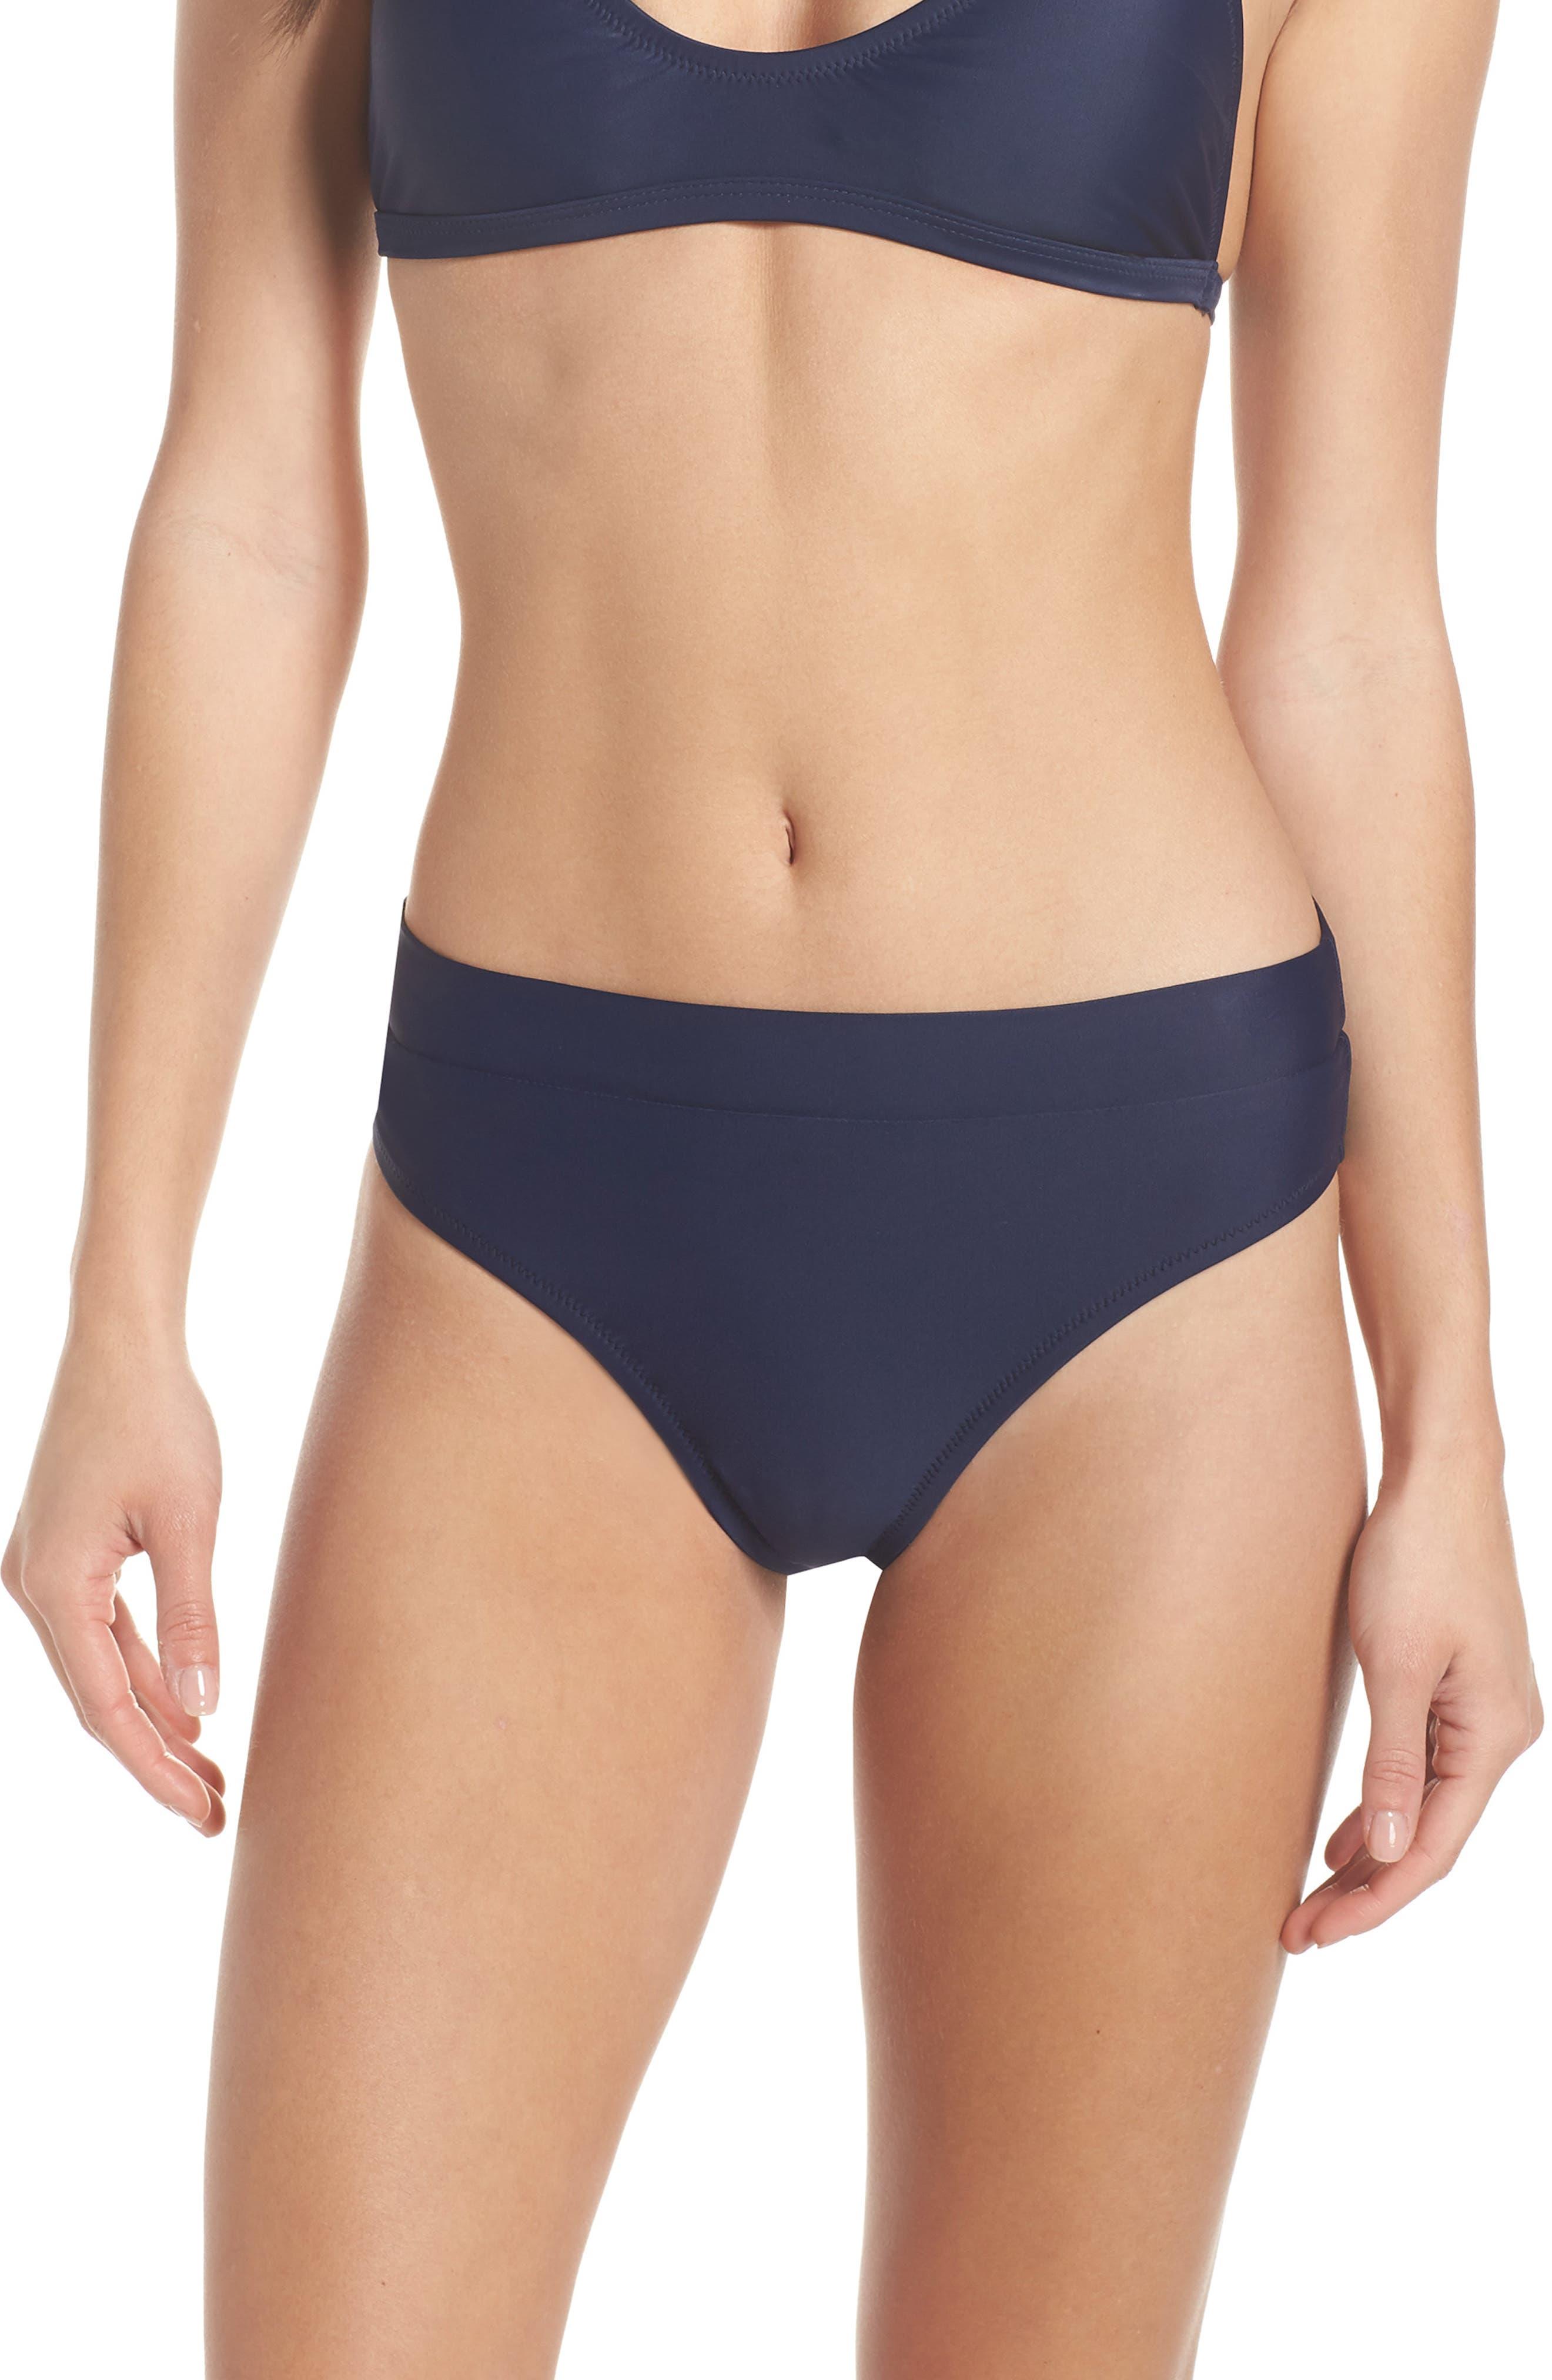 Franklin Hipster Bikini Bottoms,                         Main,                         color, 410